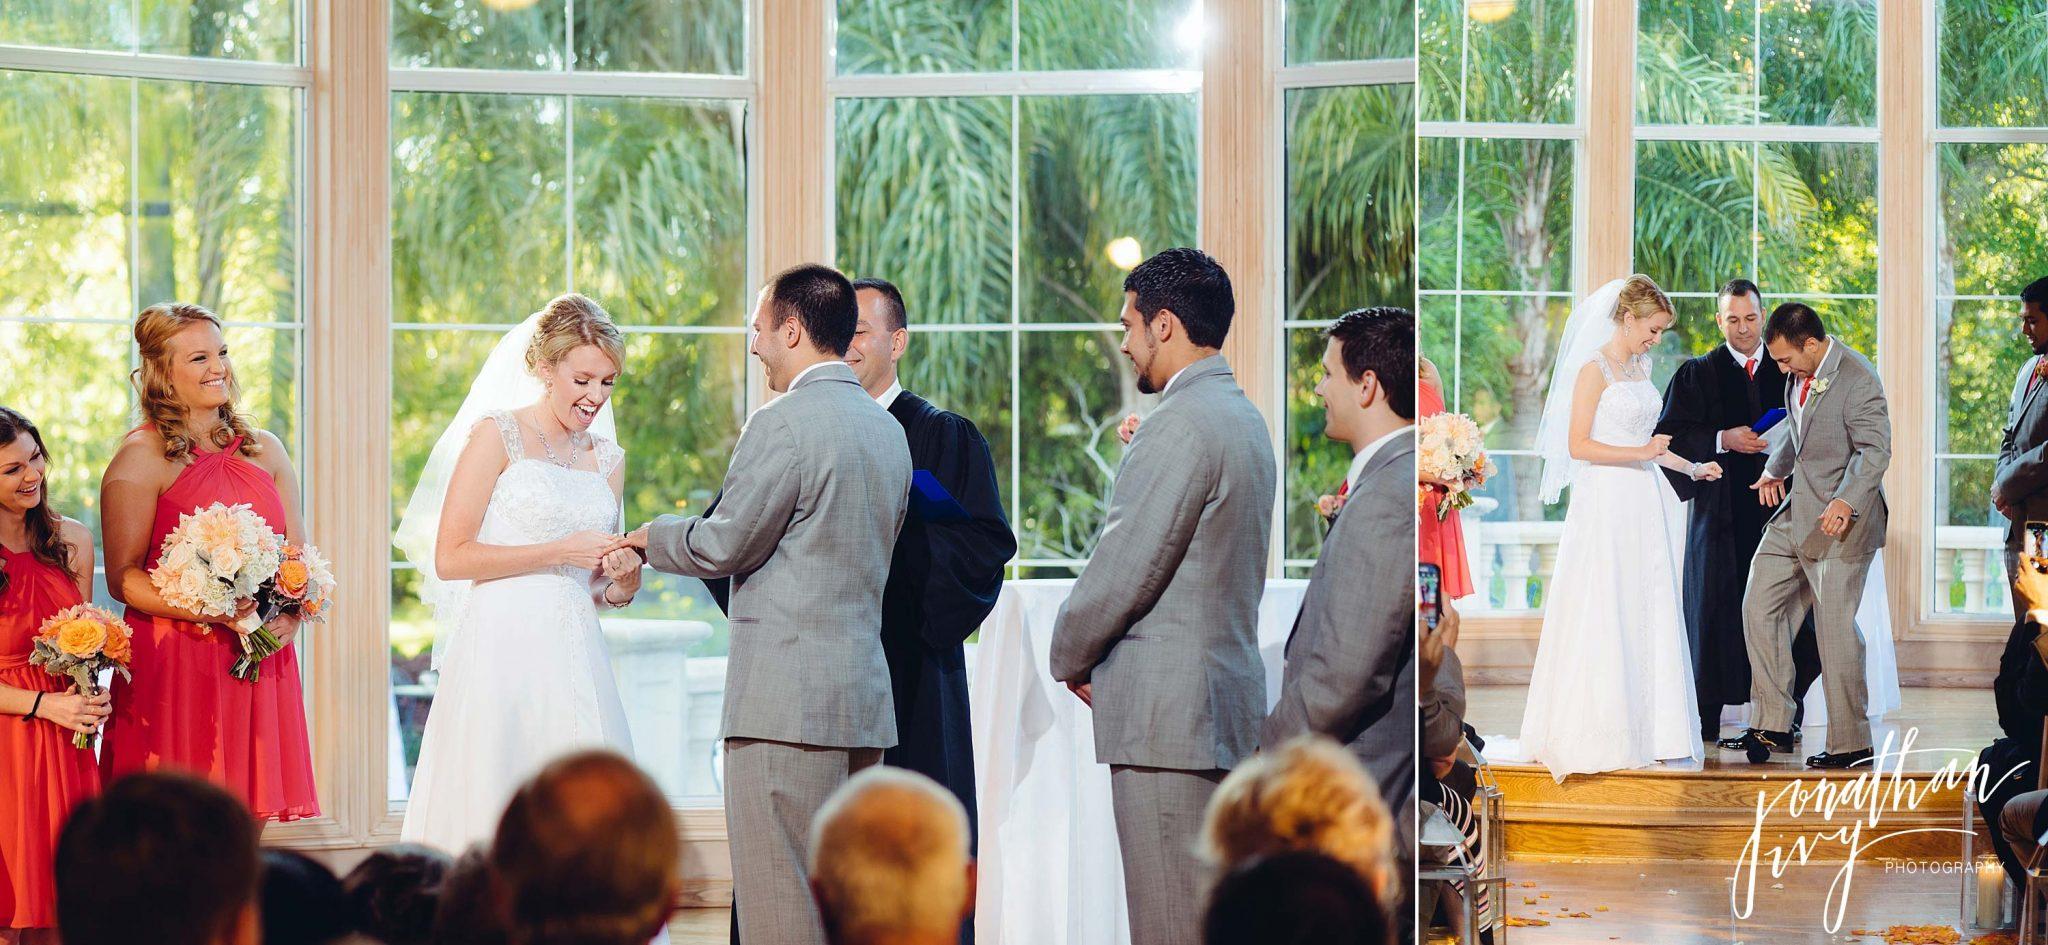 Chateau-polonez-wedding-houston_0022